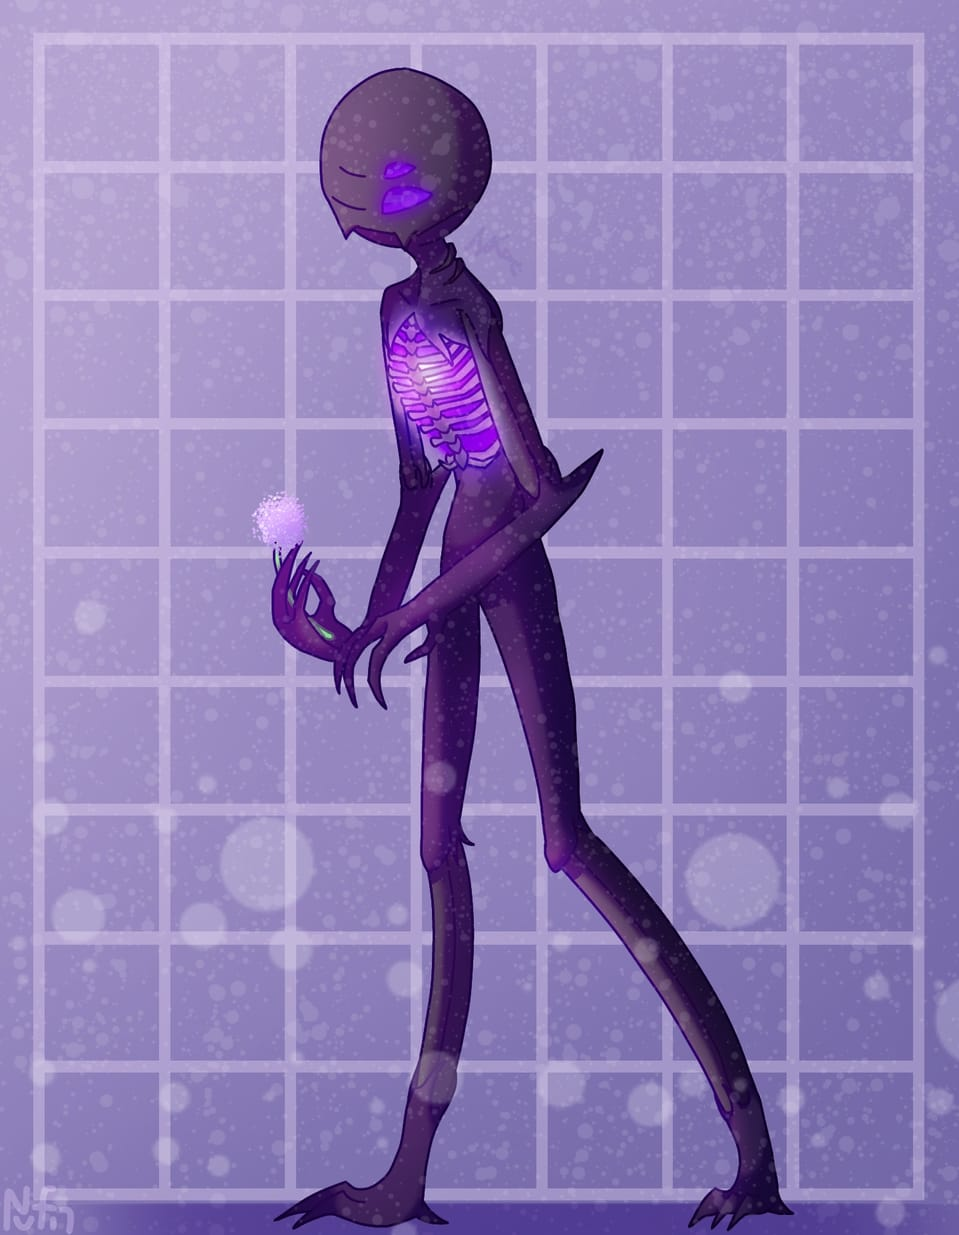 enderman :D (design idea in desc) Illust of NufinThing Minecraft enderman